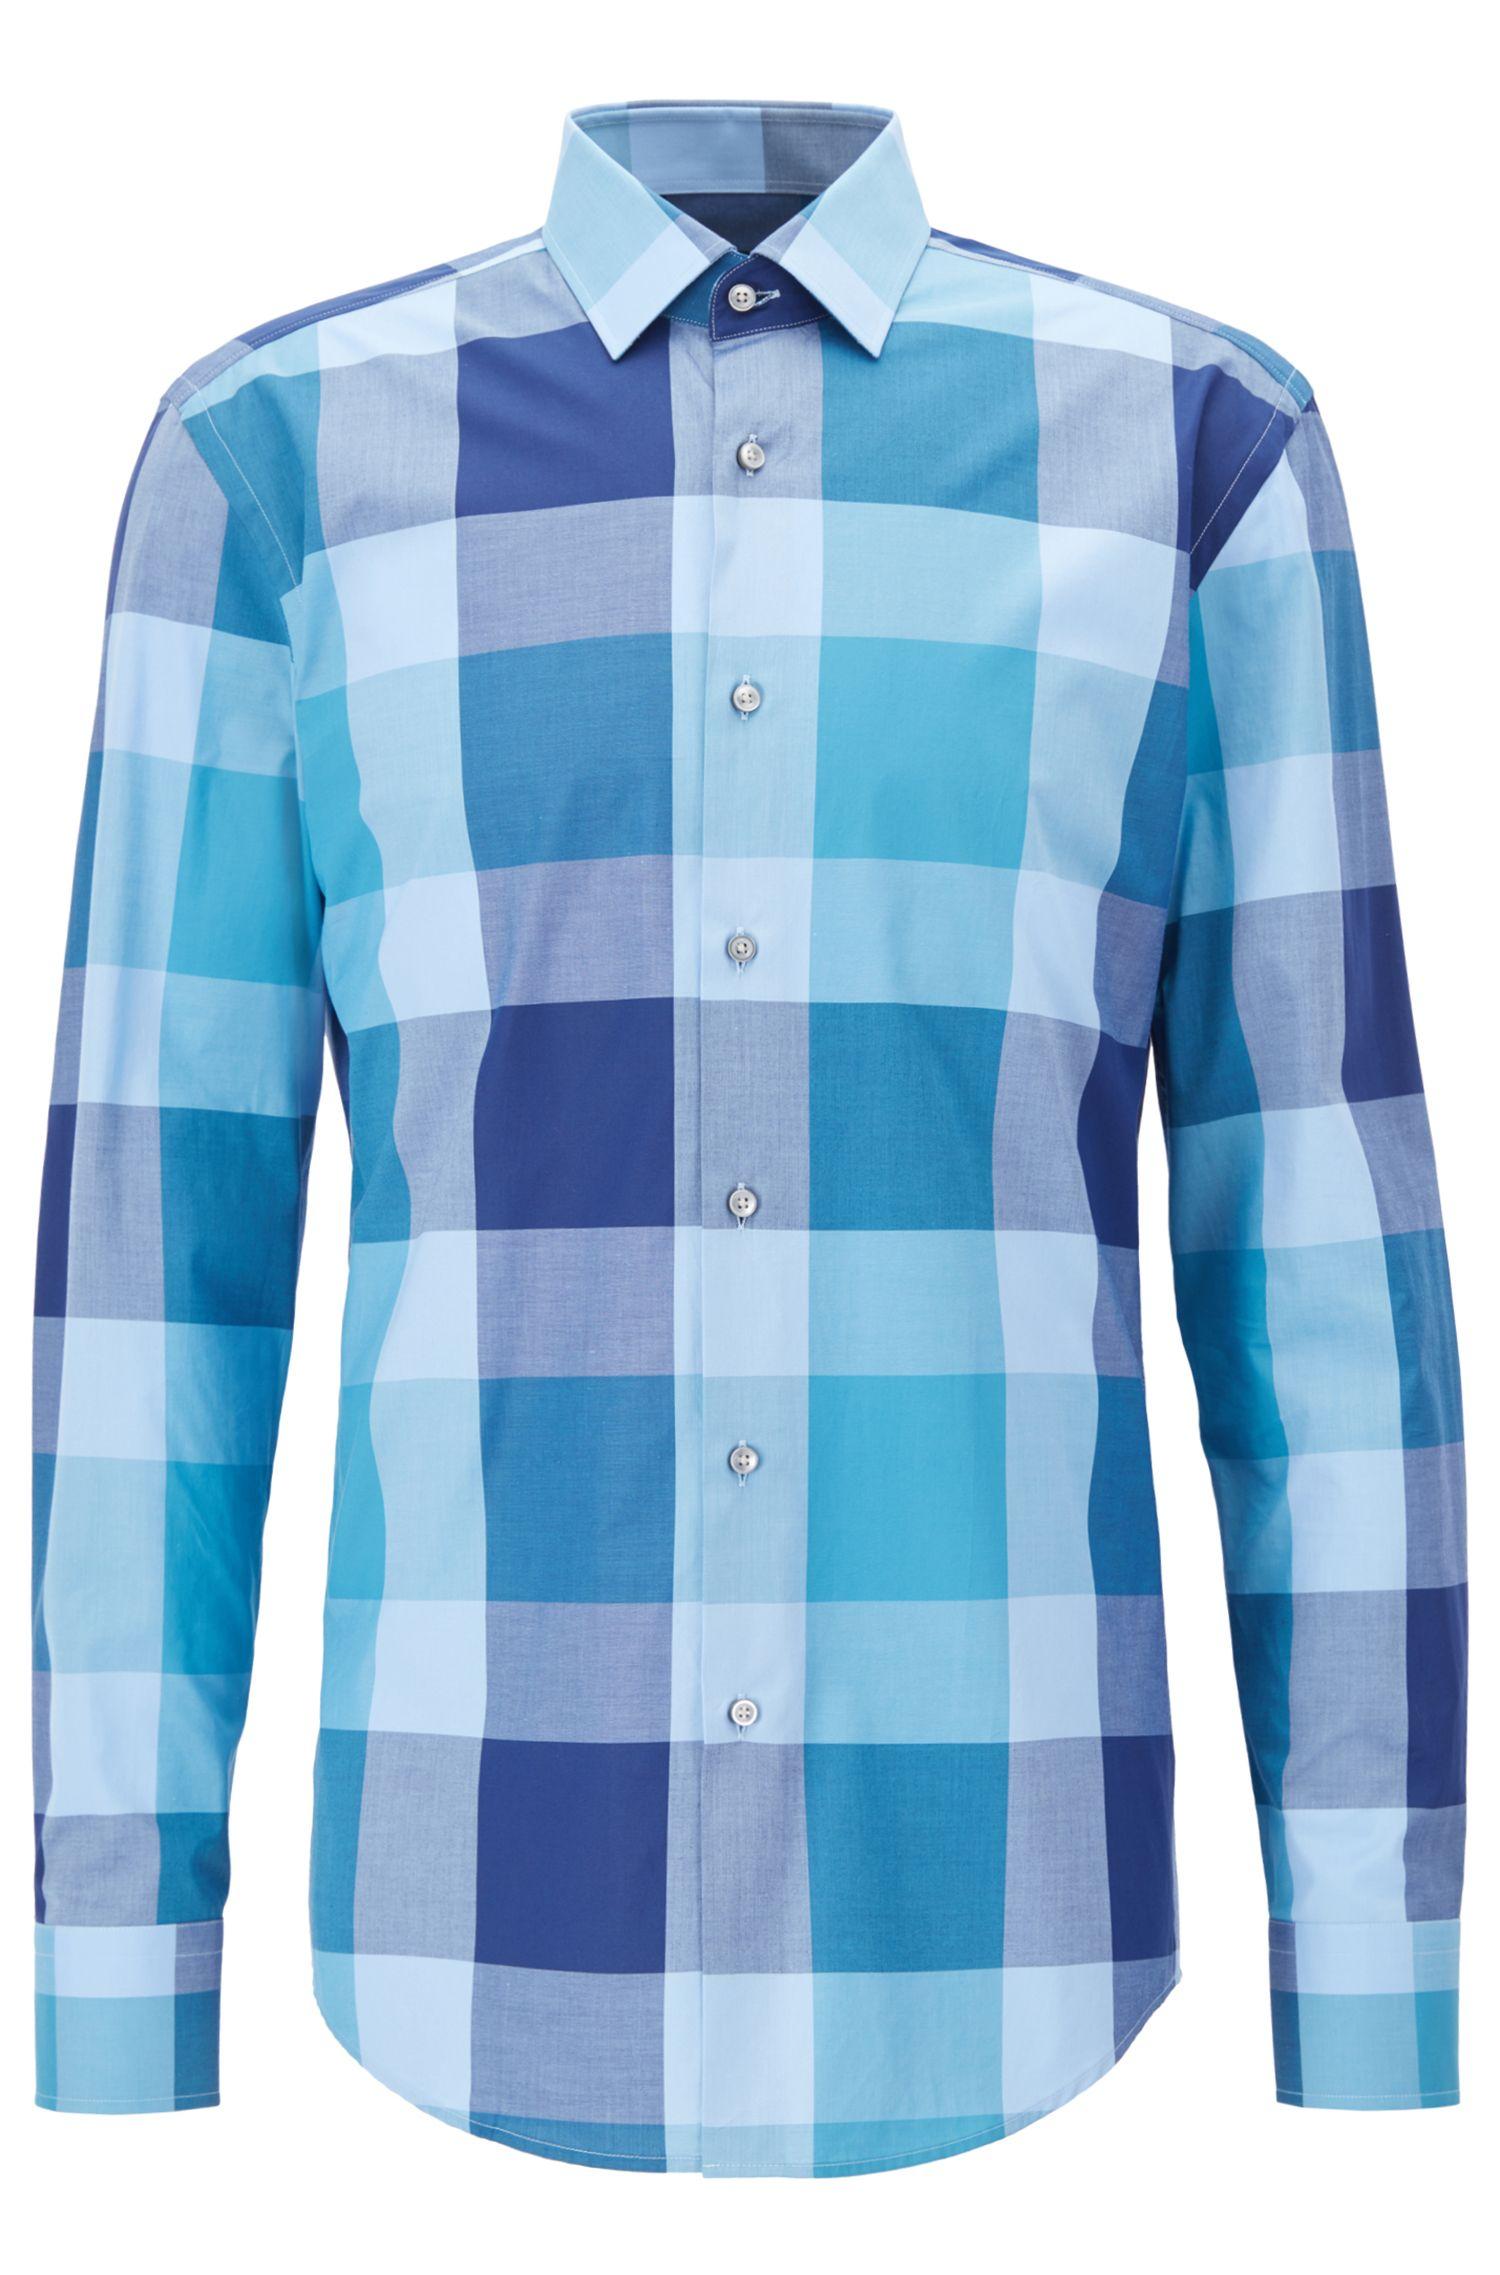 Oversize Check Cotton Dress Shirt, Slim Fit   Jenno